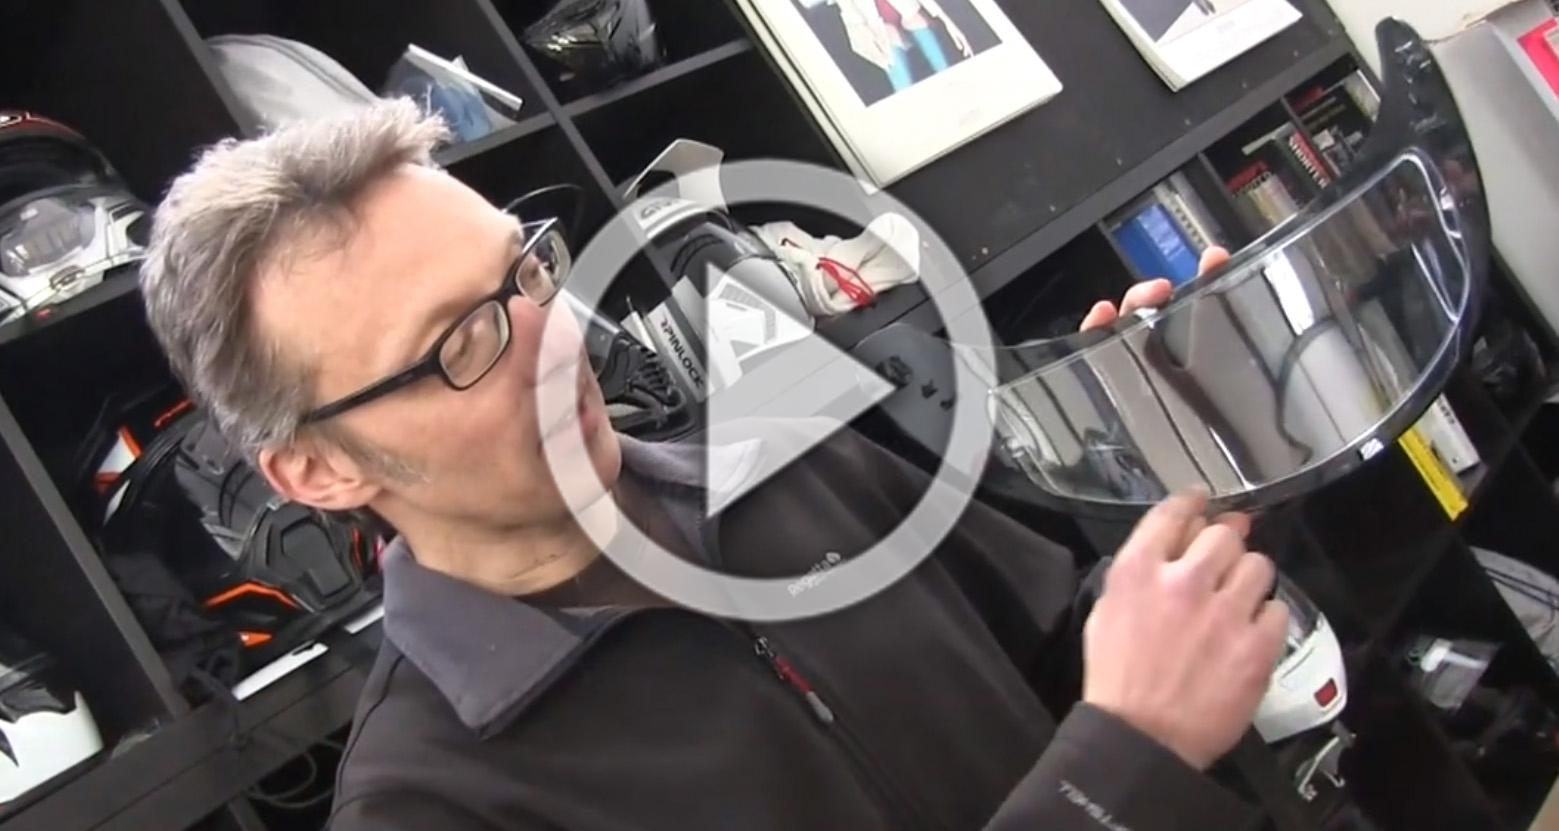 Vidéo Pratique Nettoyer Lécran Pinlock De Son Casque Moto